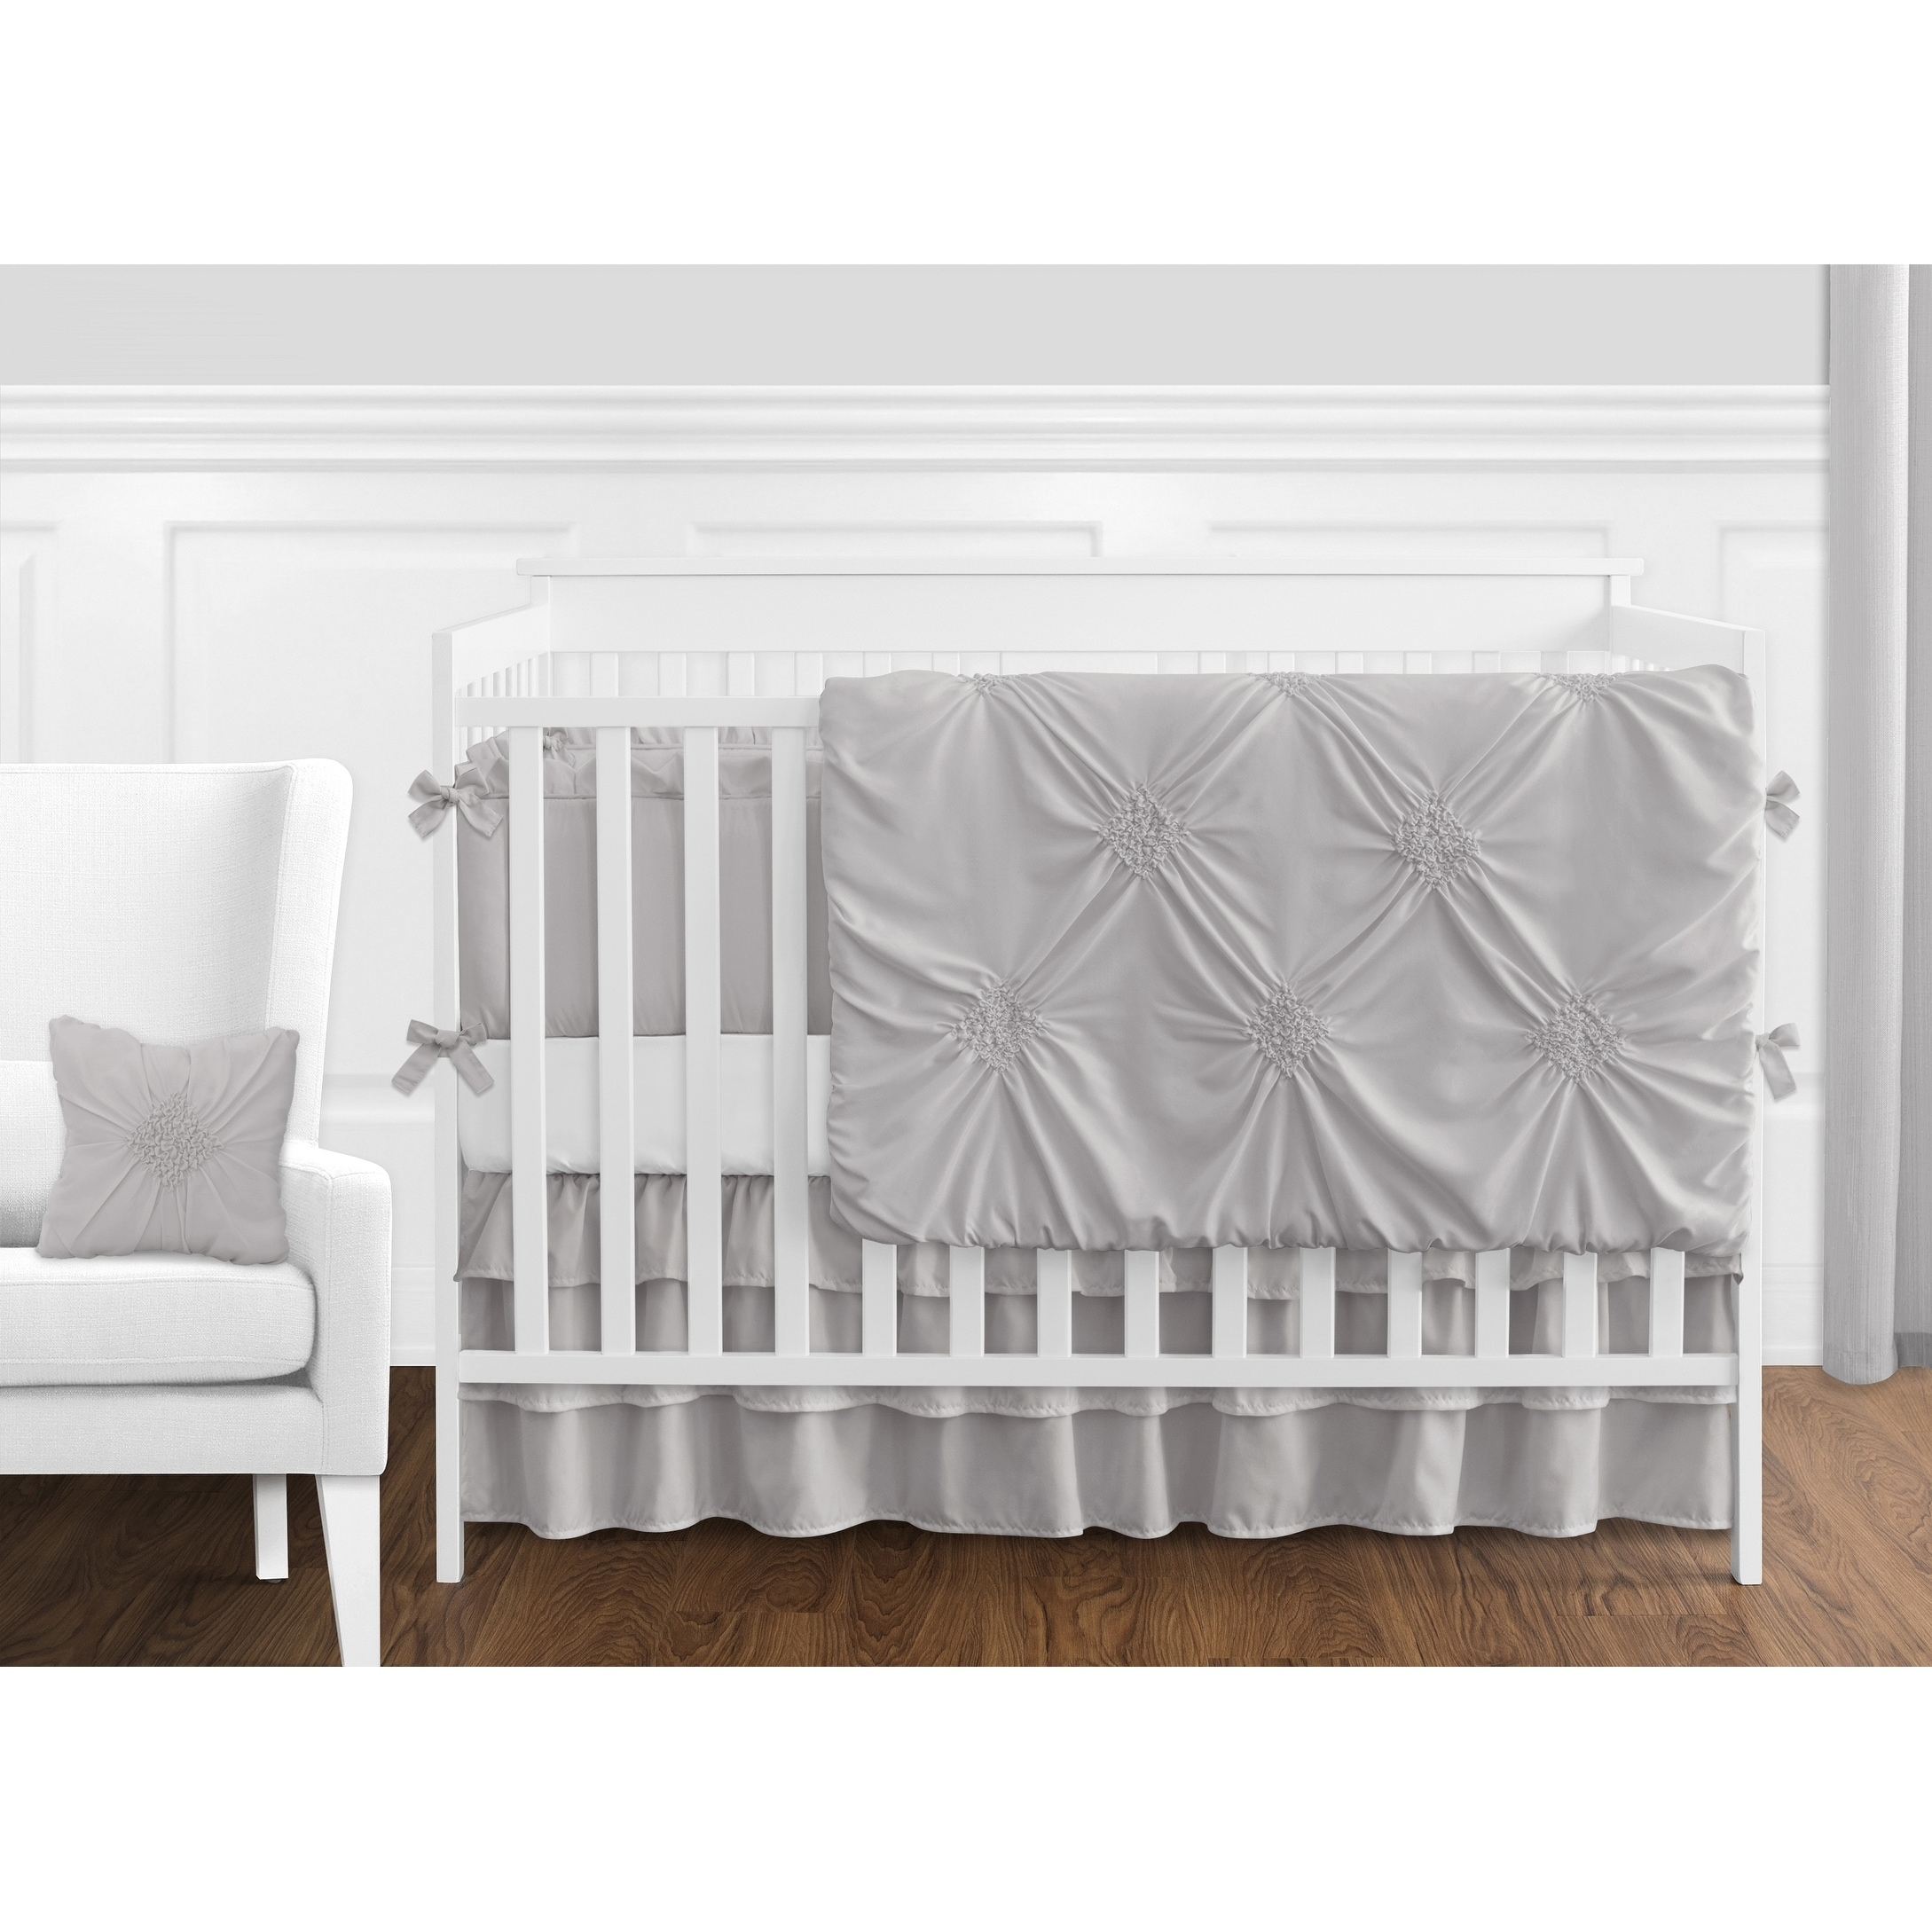 animal sweet piece bedding set collection express designs decoration jojo crib safari cribs